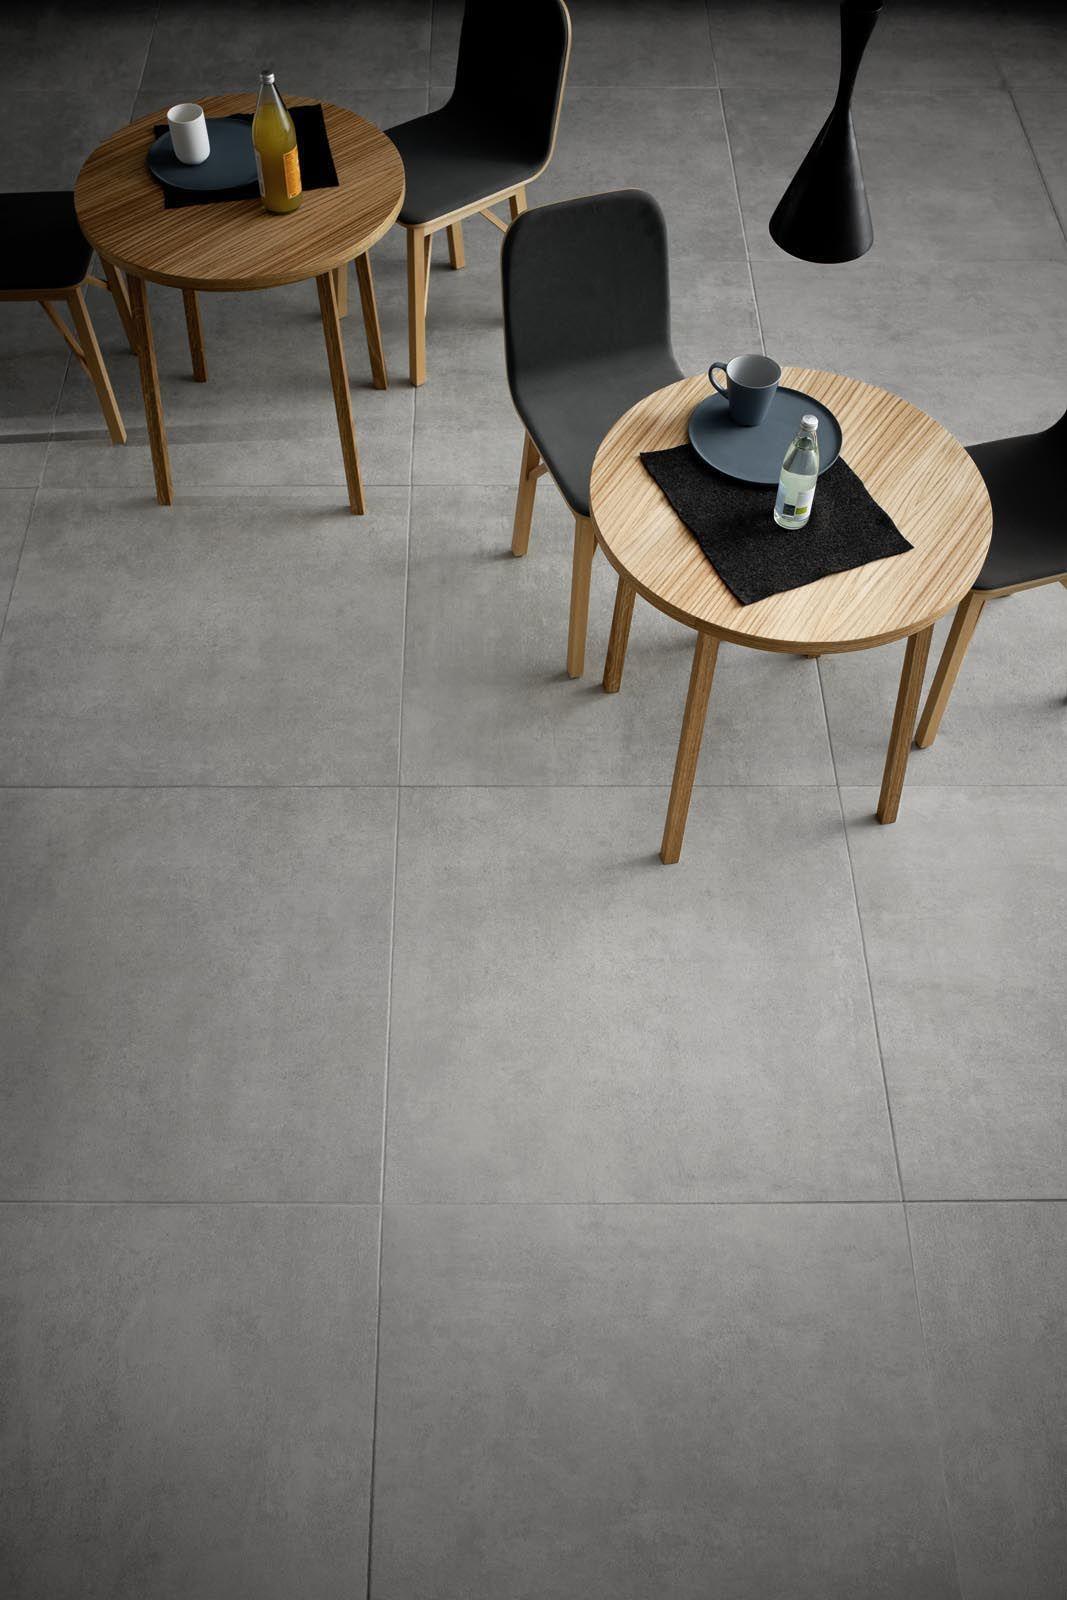 Gres Porcellanato Piastrelle Cucina brooklyn – gres porcellanato effetto cemento | marazzi